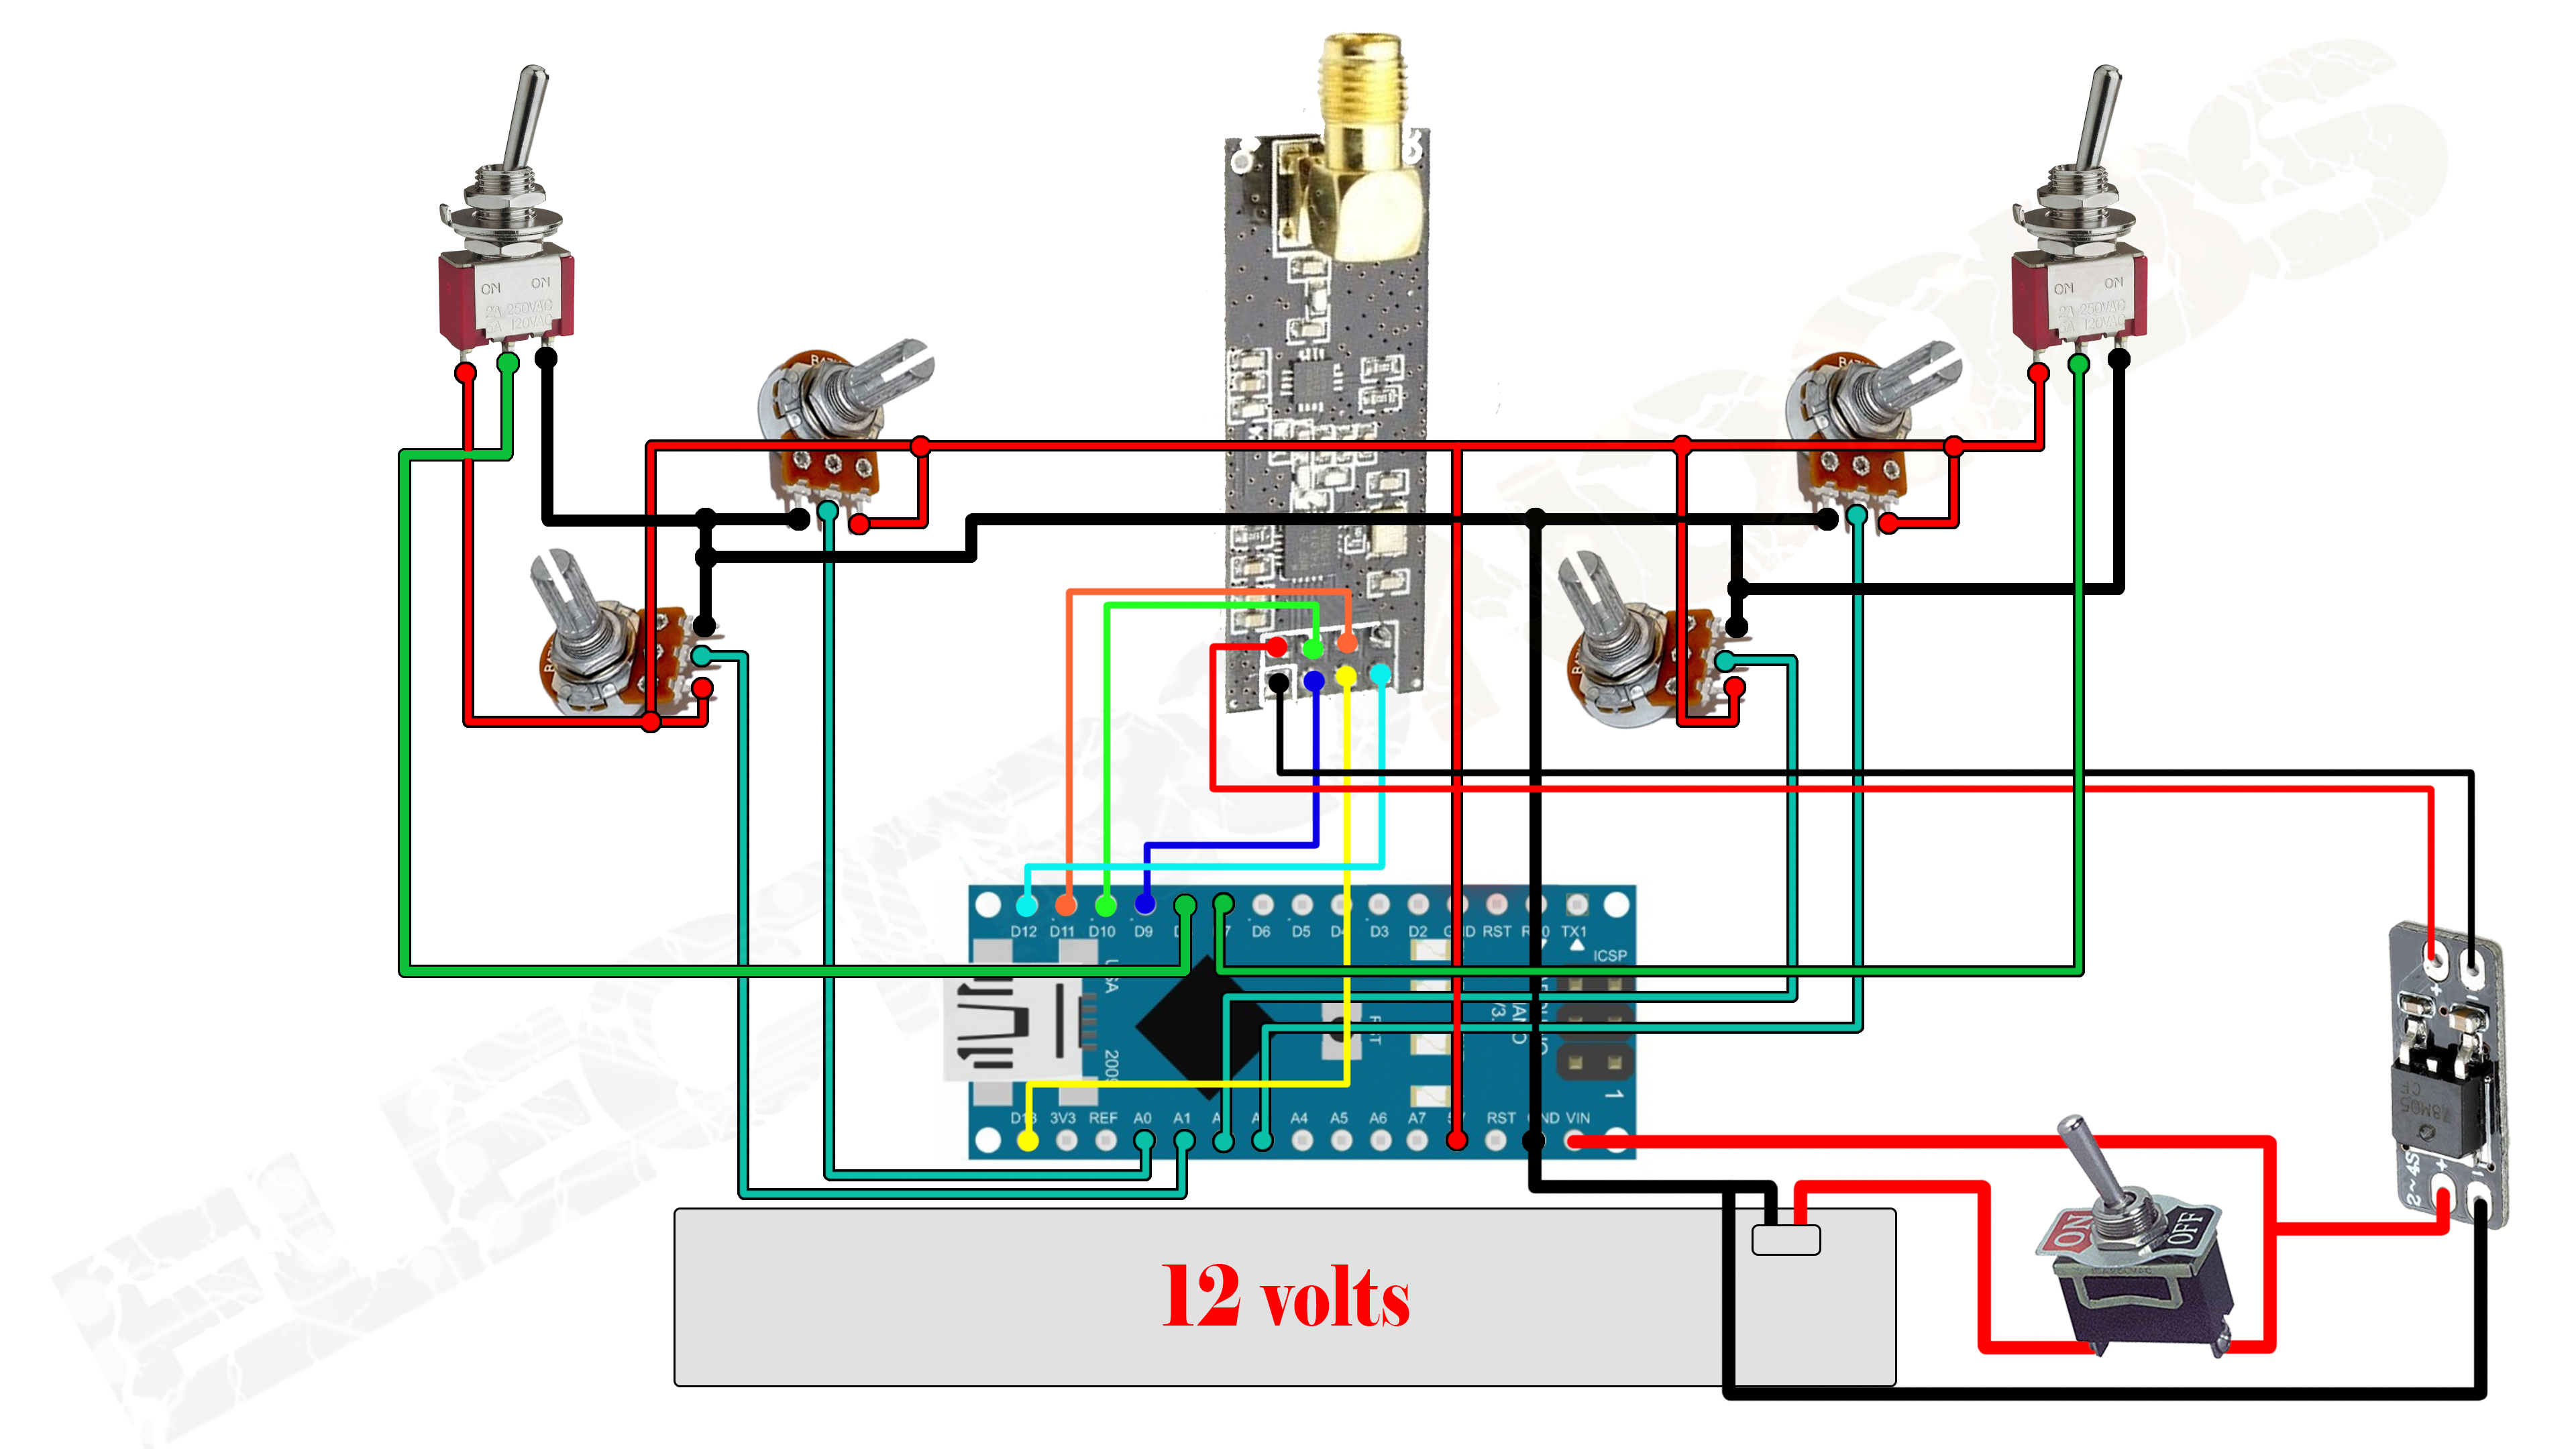 630134d08a22040389d2b9b9d1fcb6f5 Raspberry Pi Drone Wiring Diagram on arduino humidity sensor, ds18b20, dual temperature sensor, ppd42ns, hiletgo max7219, diagram adafruit power boost 1000c, diagram for 16 function relay, relay board,